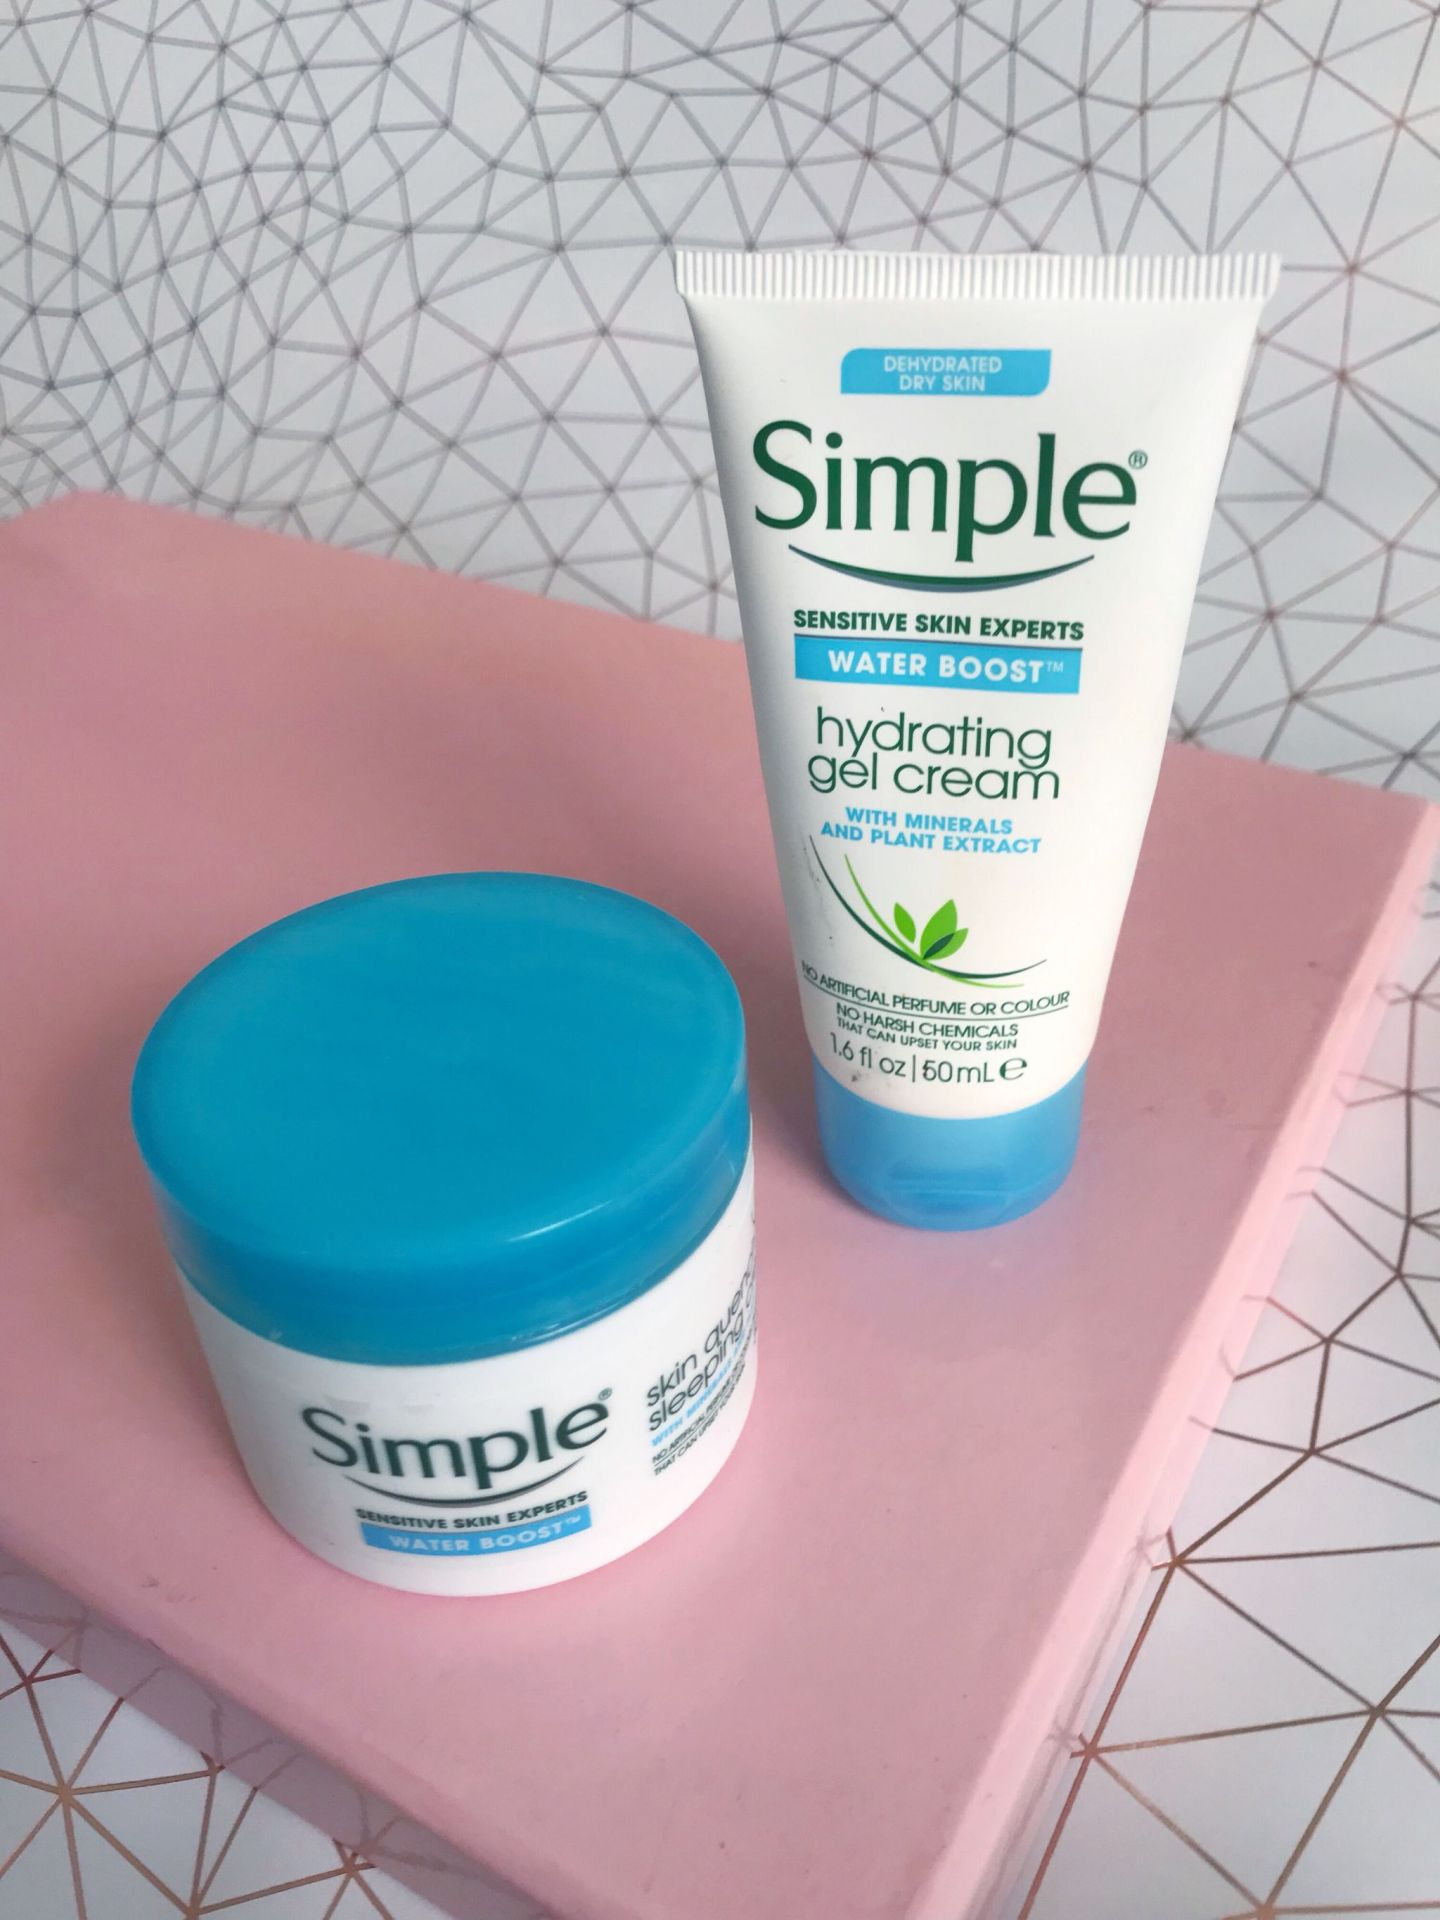 Simple Water Boost skincare range